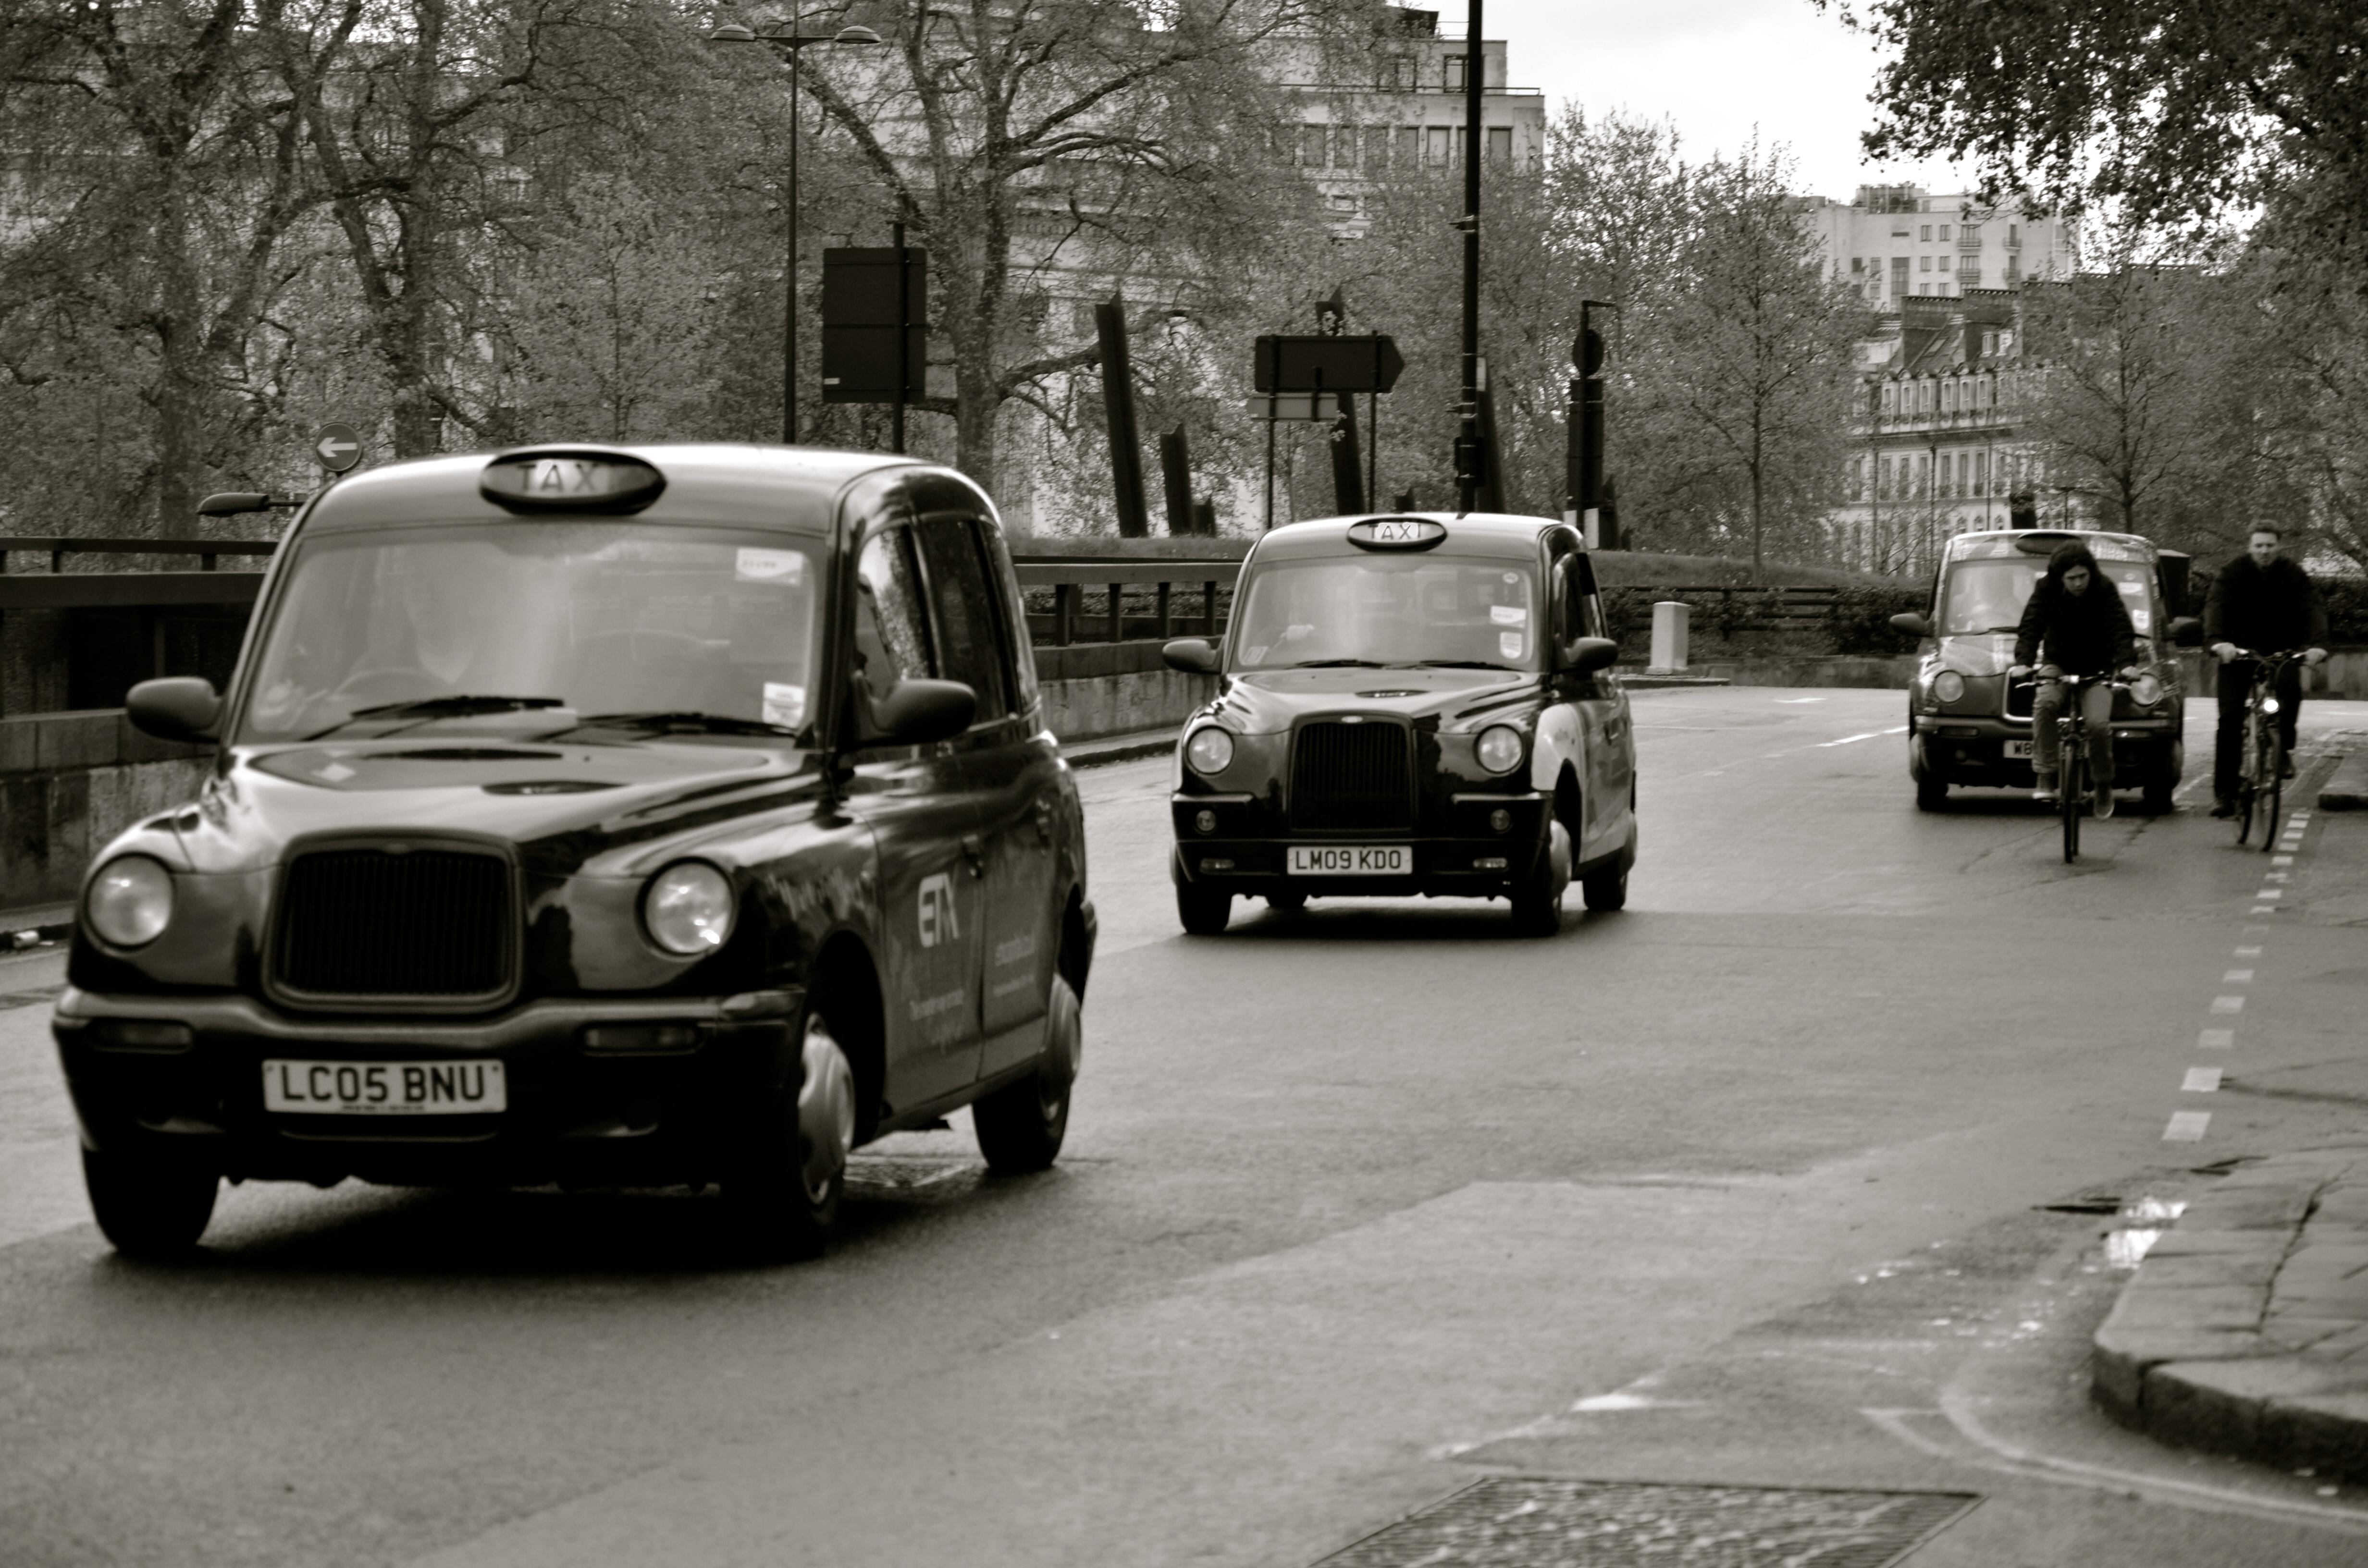 London Taxi by HGABALDON